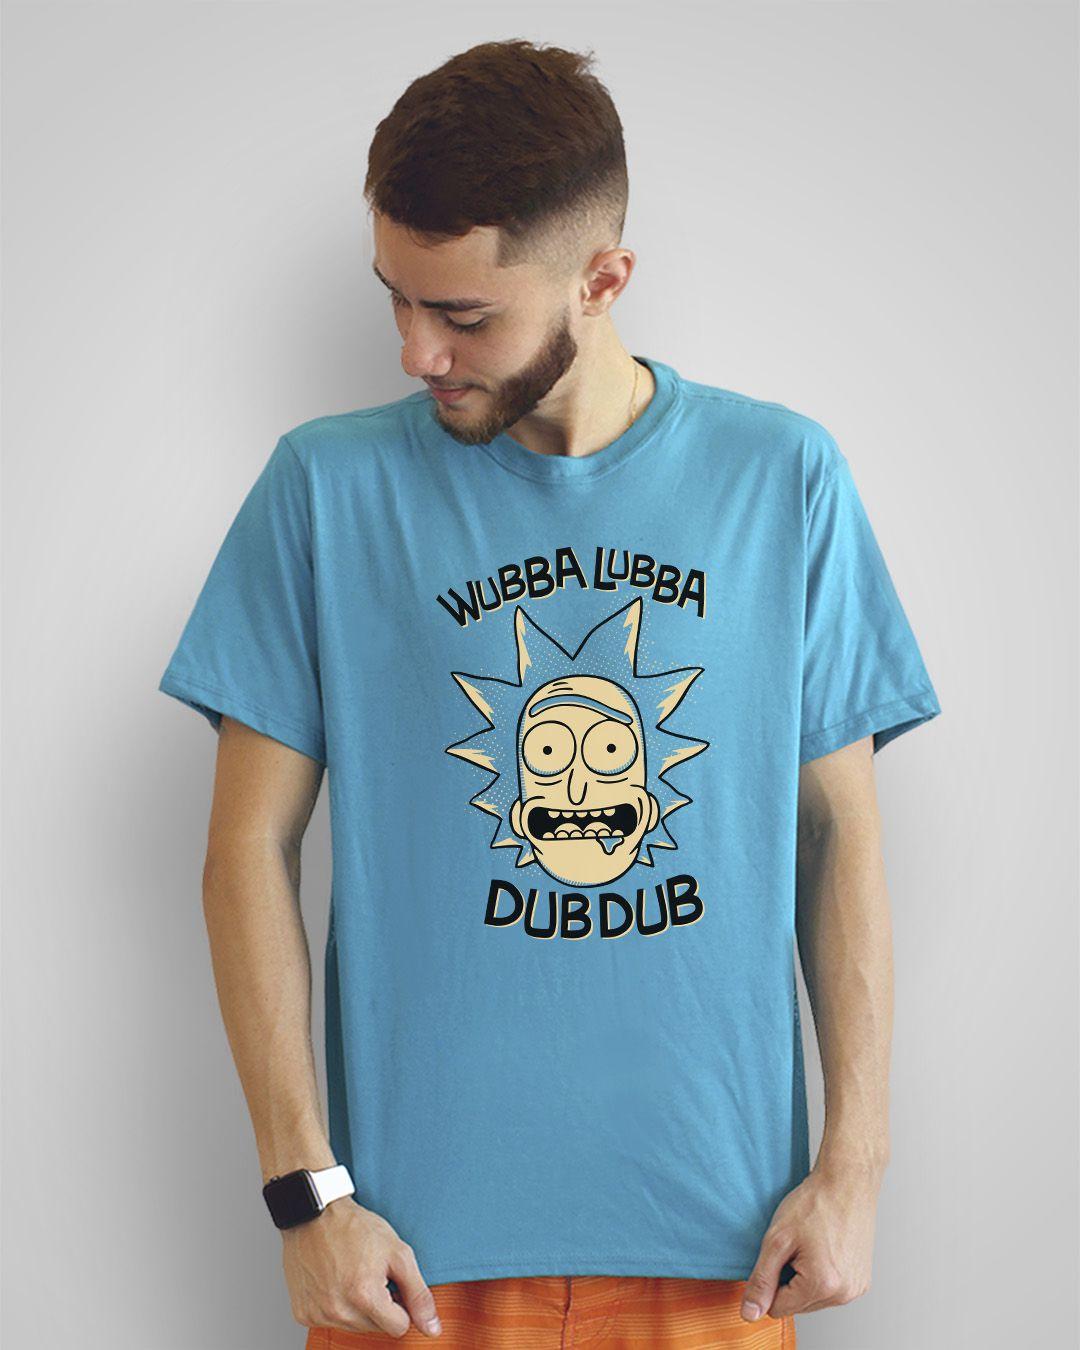 Camiseta Wubba lubba dub dub - Rick and Morty